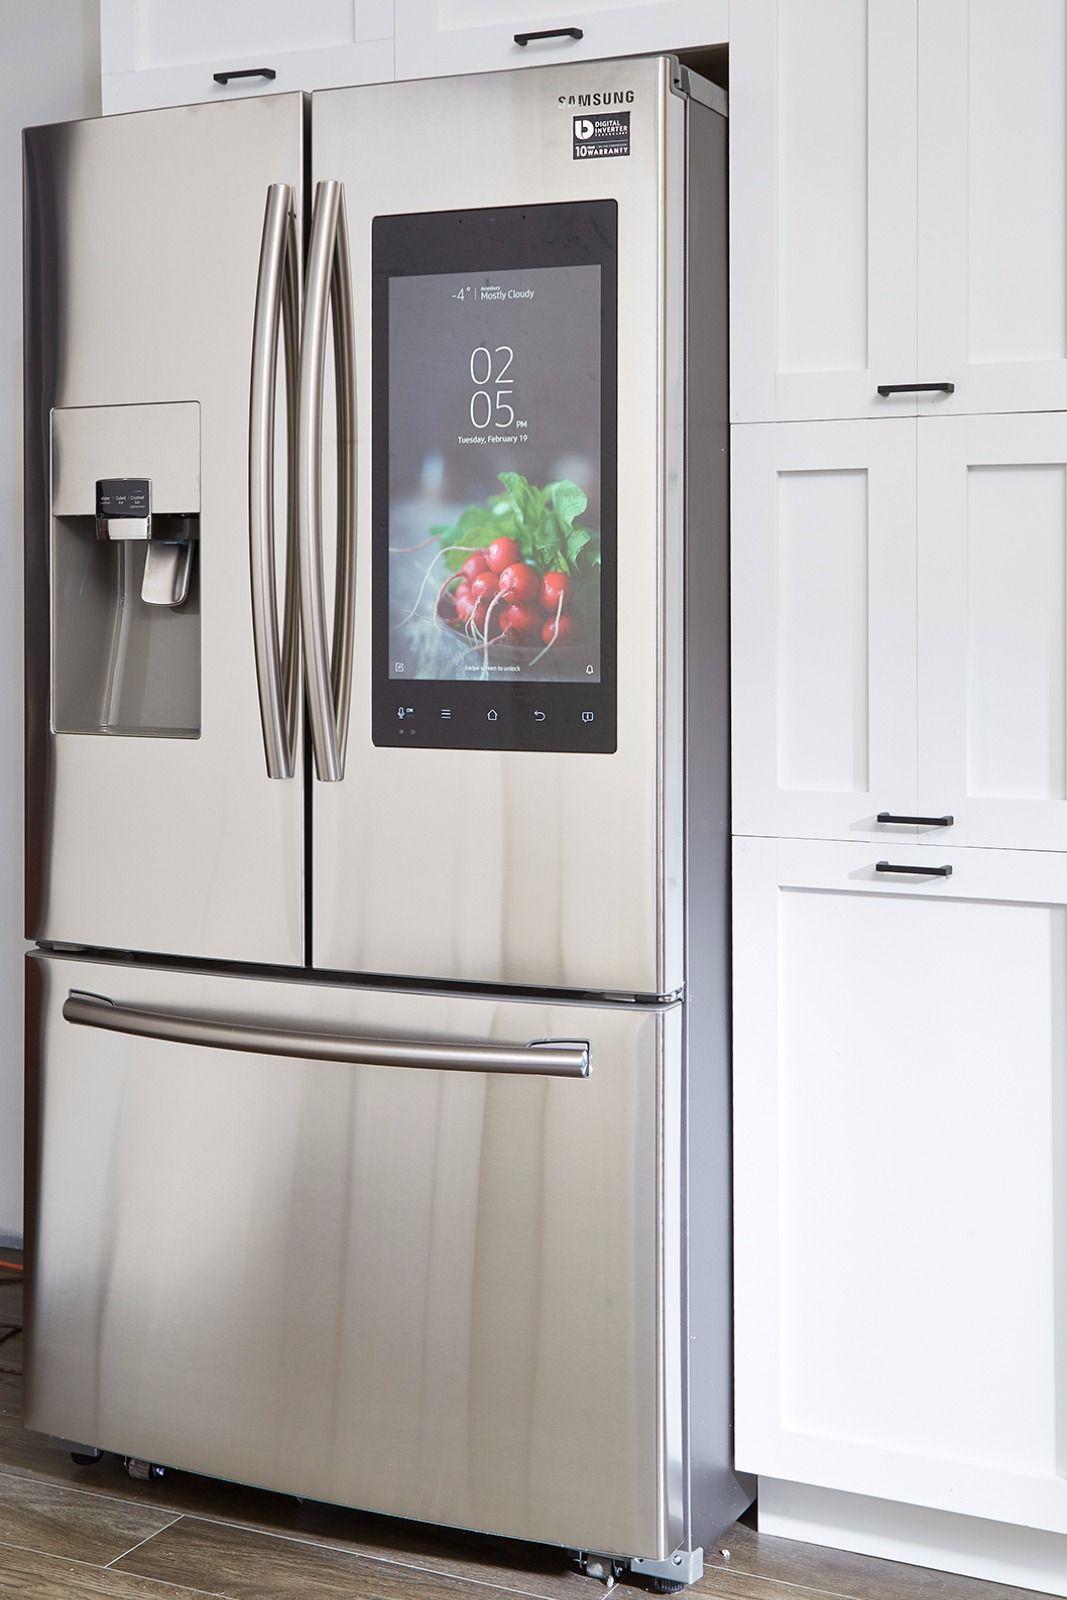 Samsung Refrigerator Demo Mode How To Turn Off Samsung Refrigerator Samsung Family Hub Display Refrigerator